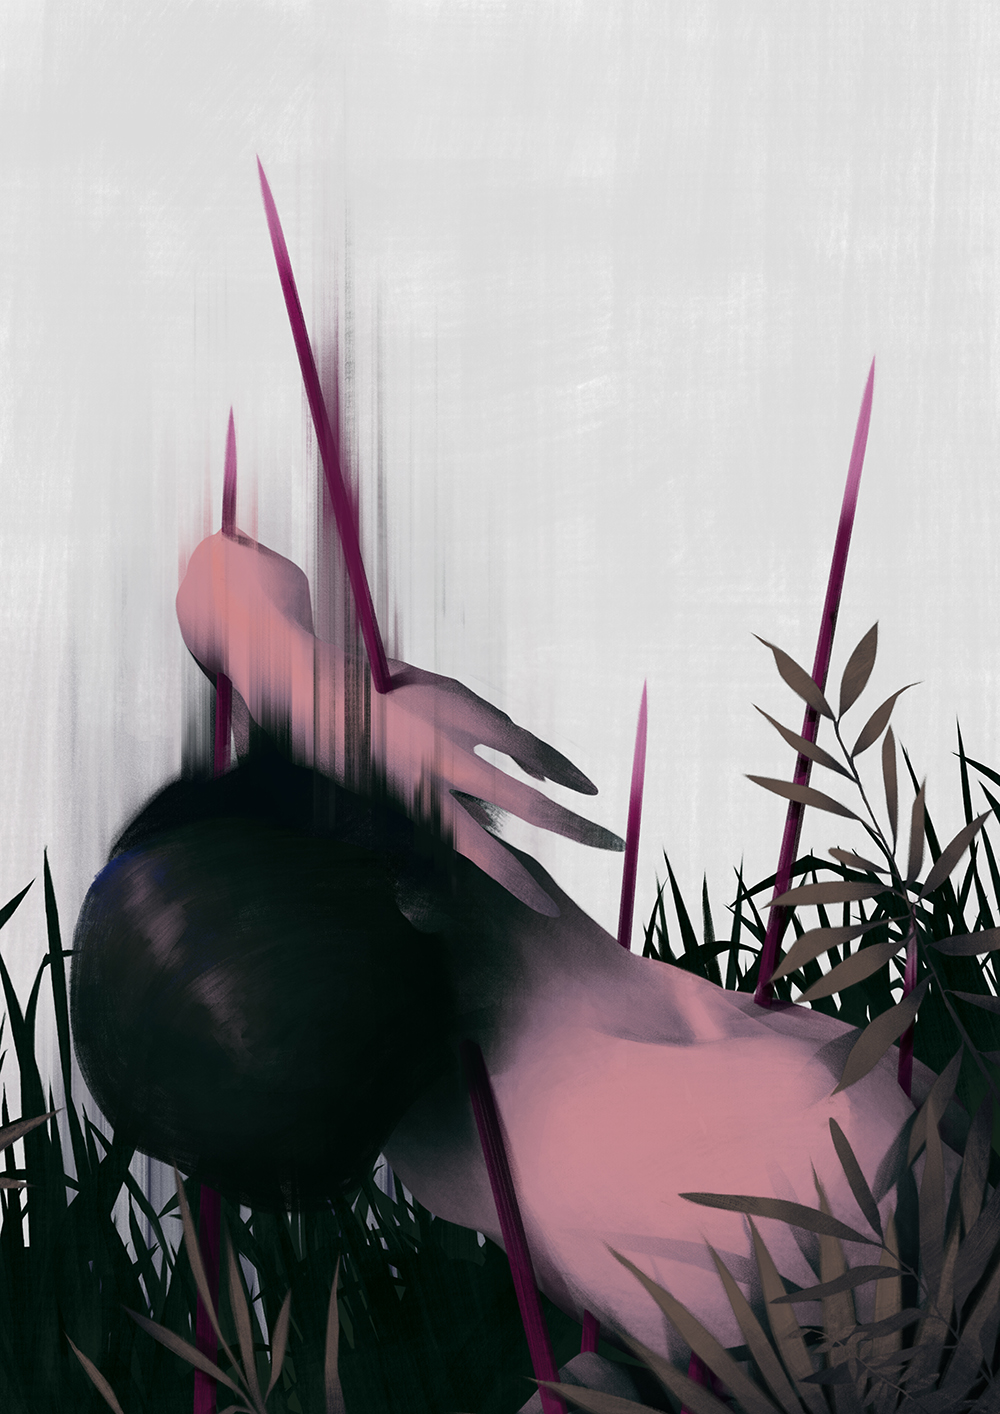 mojowang_illustration_betweenrivers_rilkean_4.jpg